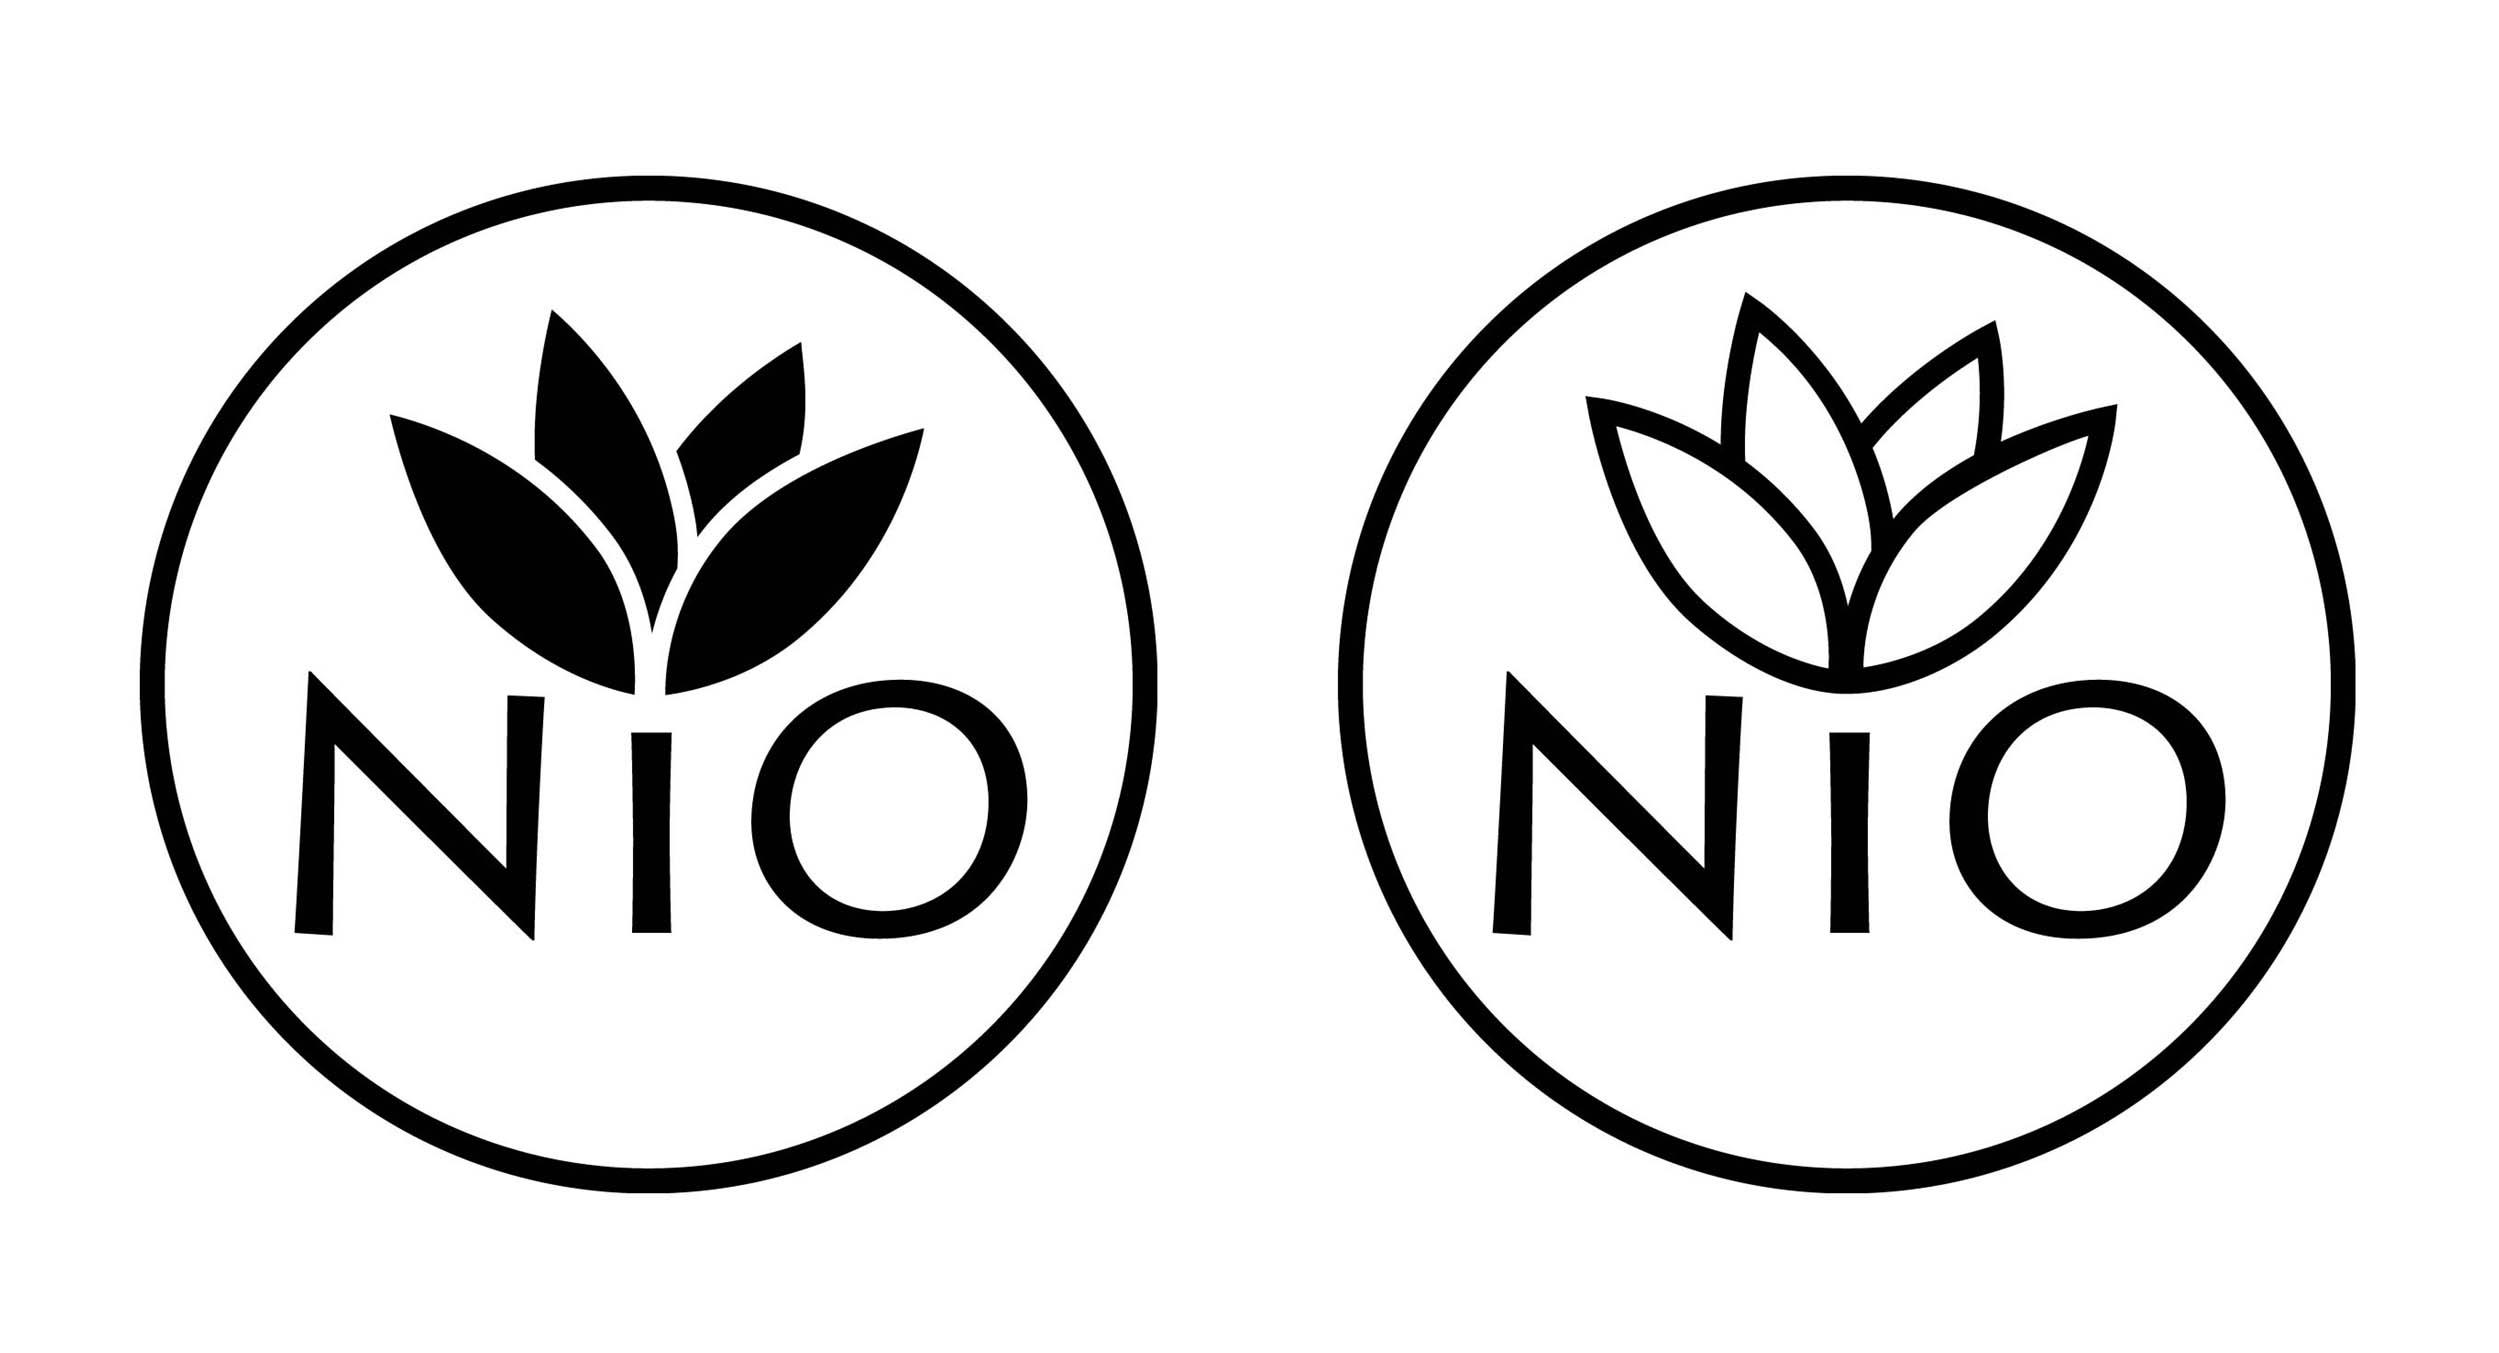 nio_logo_2.jpg